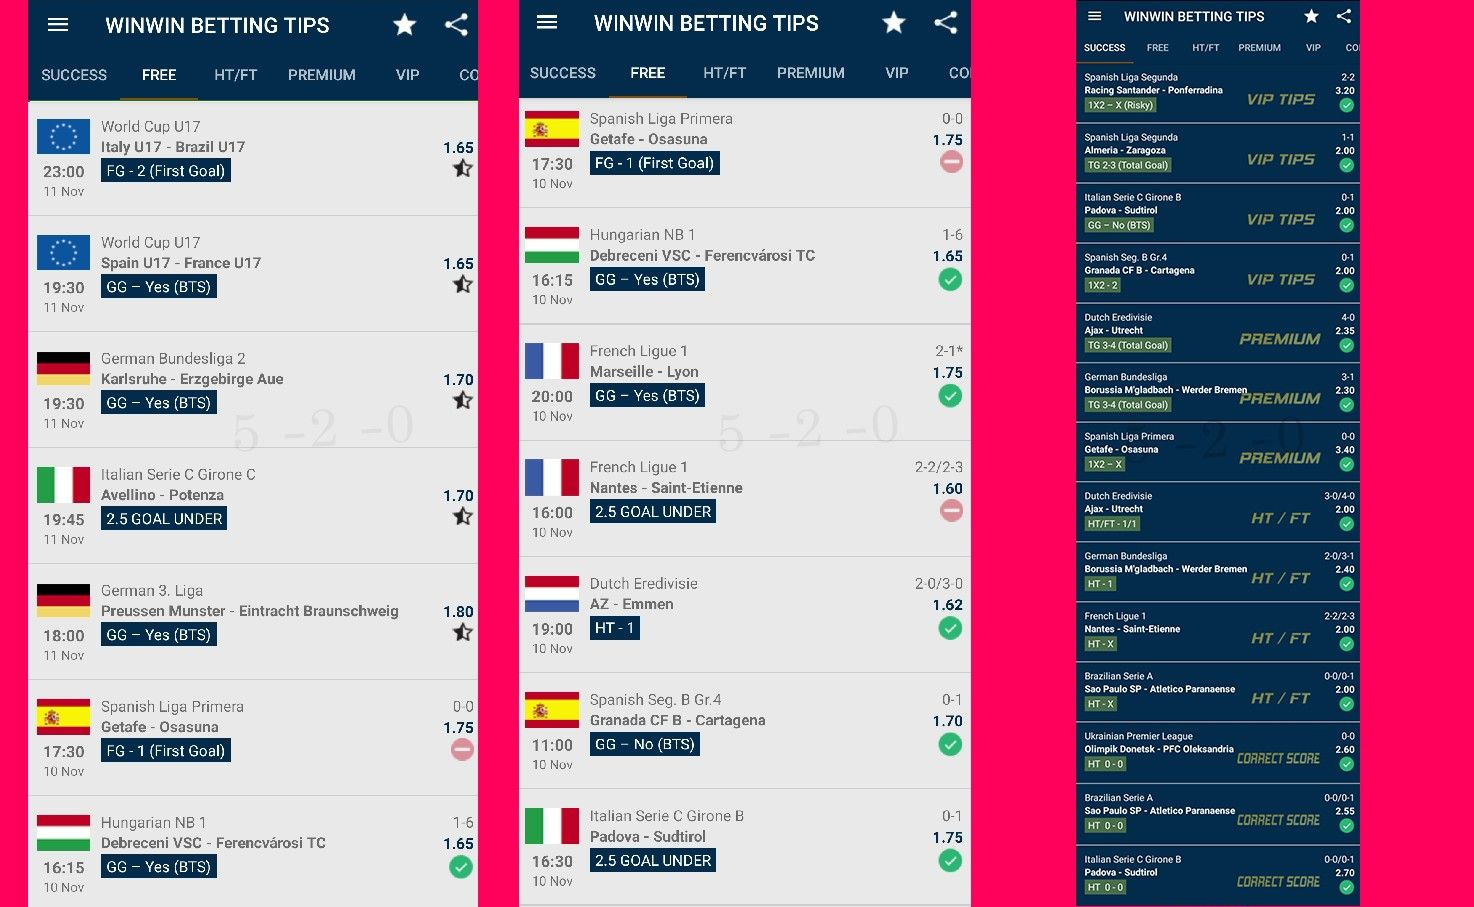 Kastamonuspor vs galatasaray betting tips world golf match play betting trends